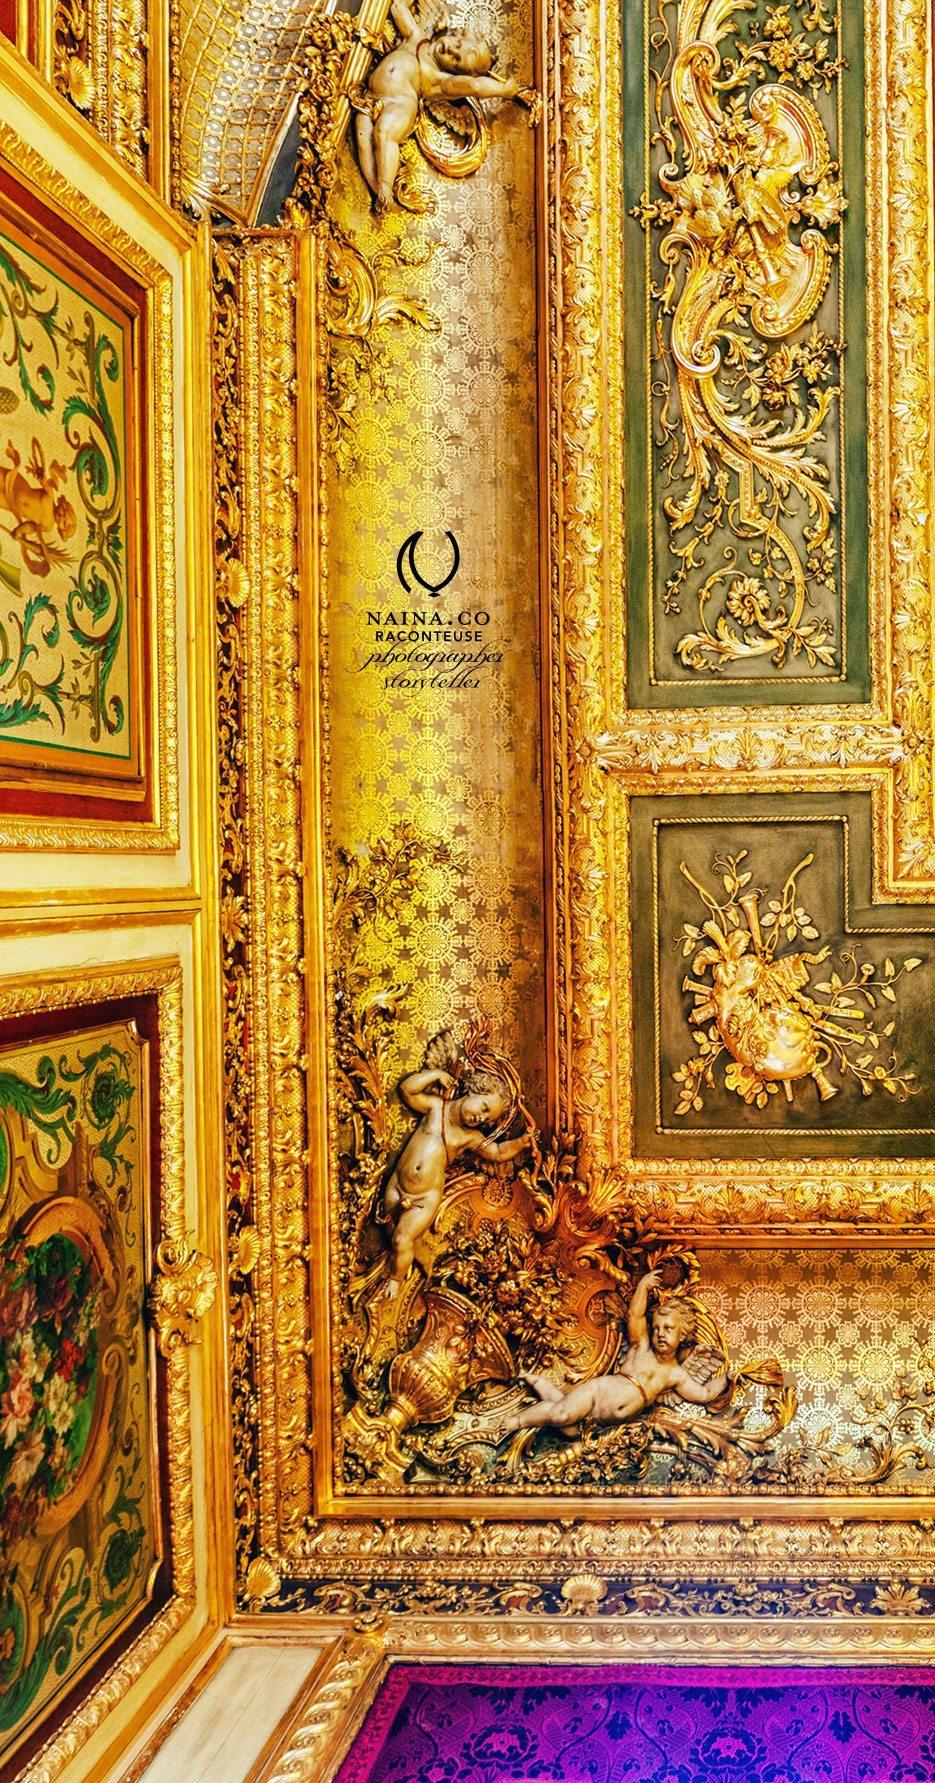 Naina.co-Louvre-Museum-Paris-France-EyesForParis-Raconteuse-Storyteller-Photographer-Blogger-Luxury-Lifestyle-090